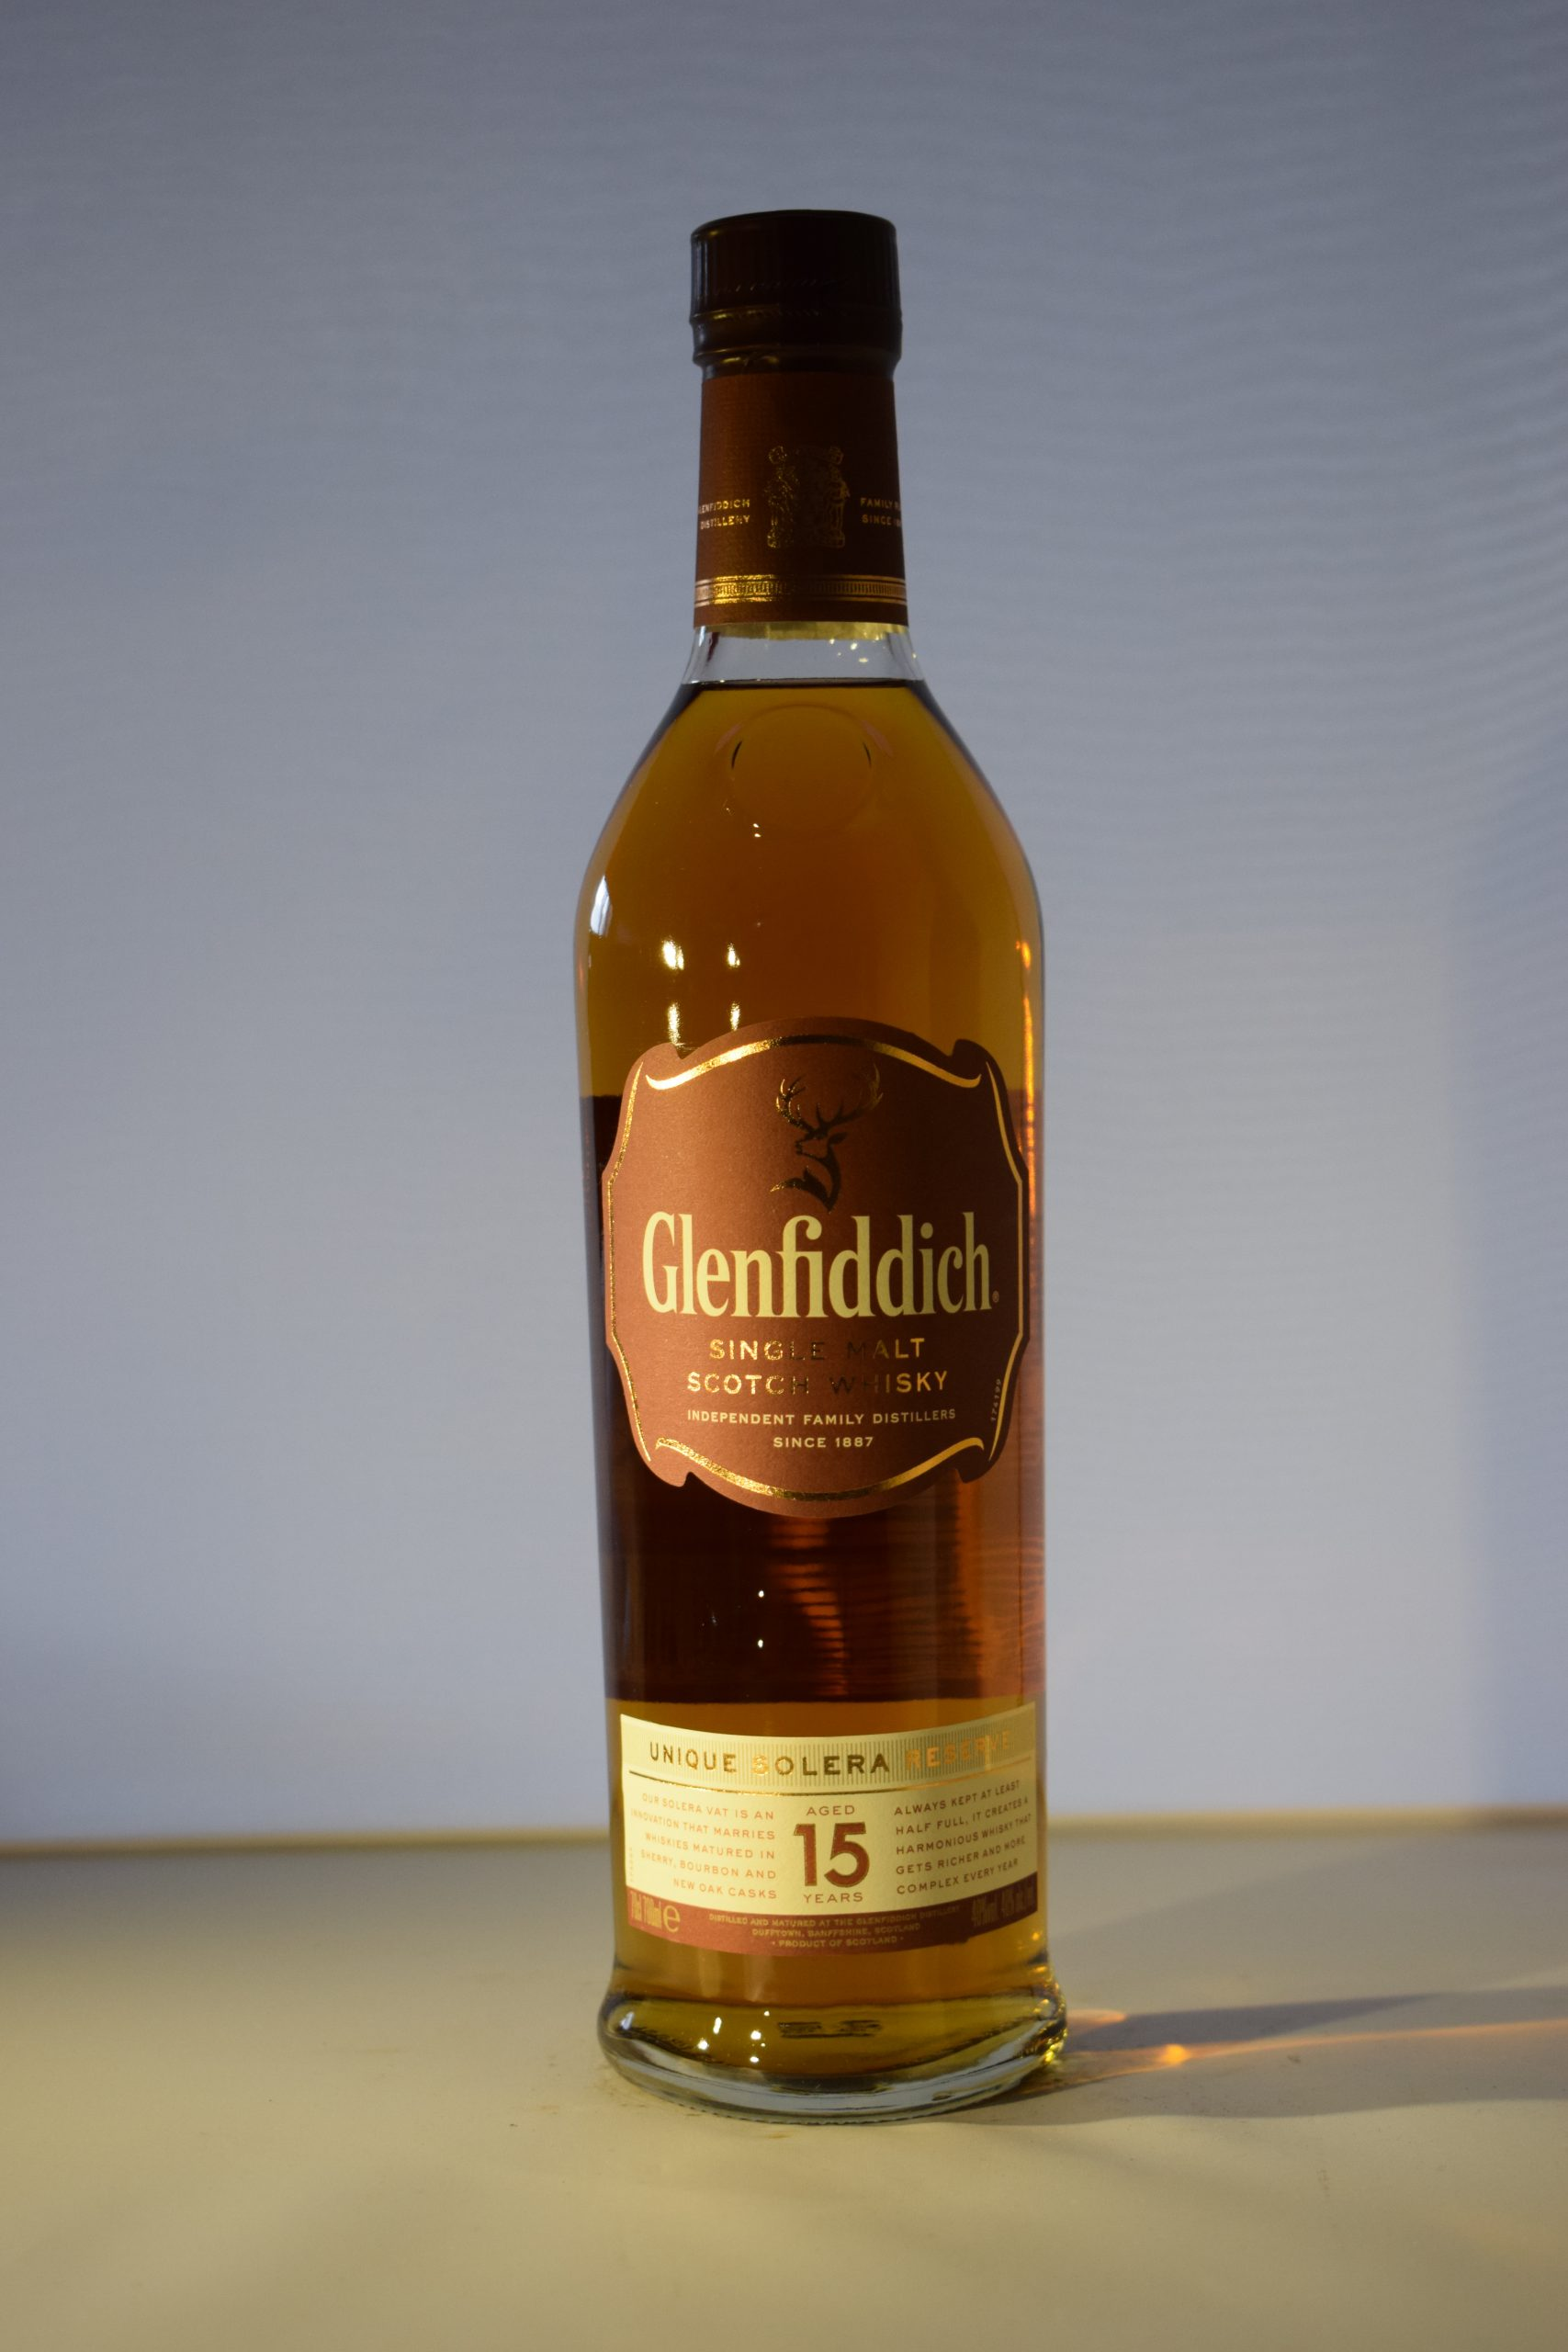 Glenfiddich Solera Reserve 15 Year Old Single Malt Scotch Whiskey 70CL